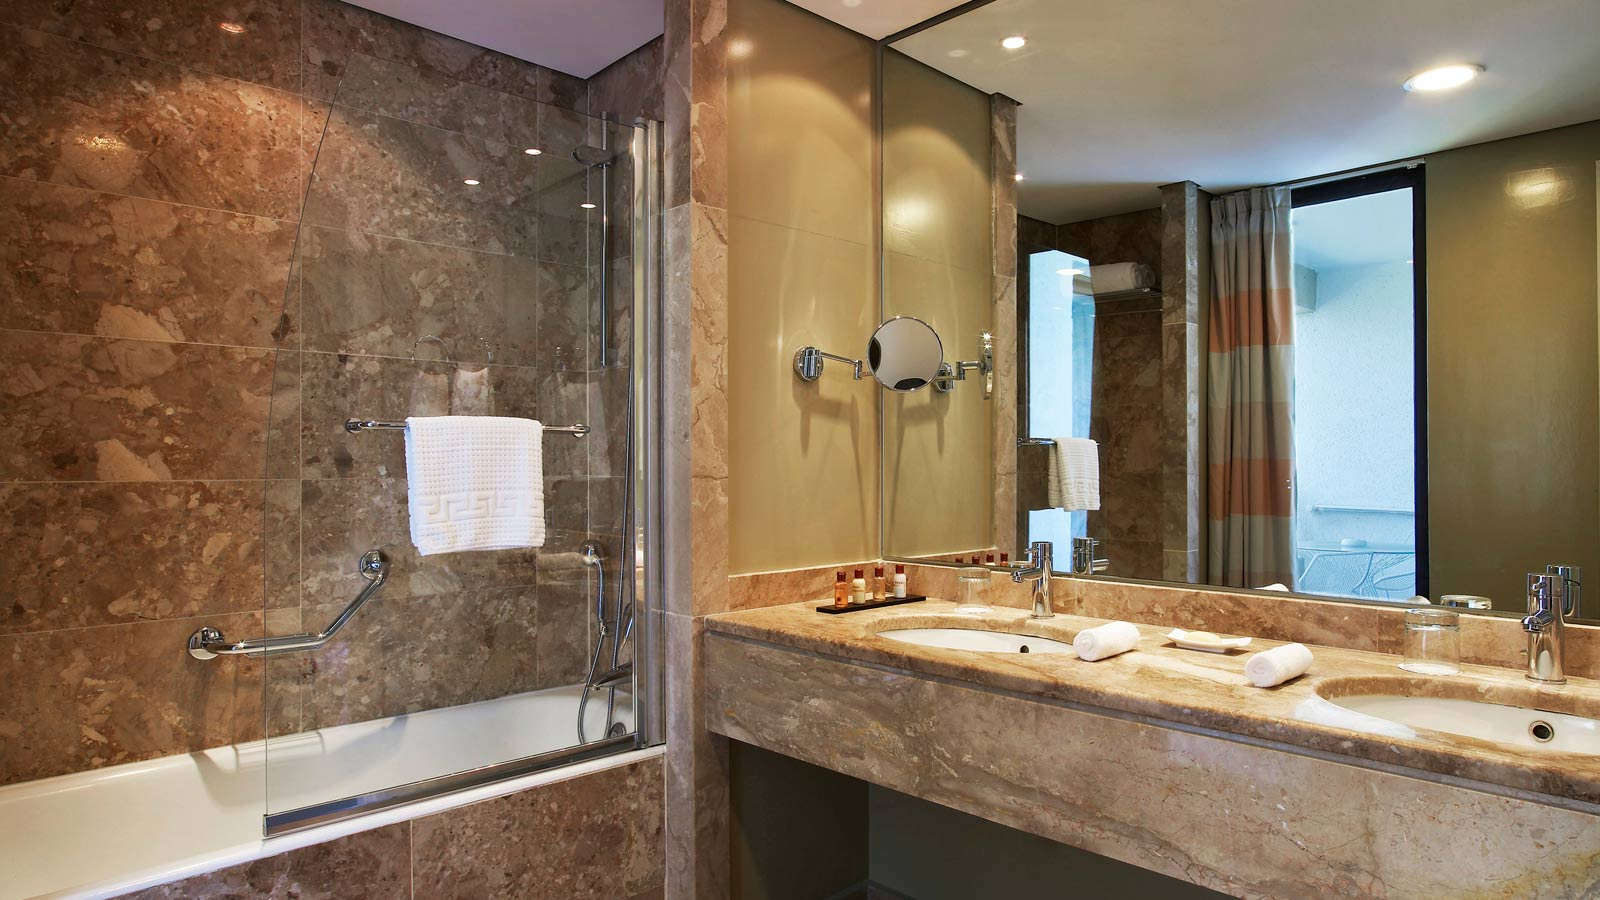 The Sheraton En Suite Bathroom: Sheraton Rhodes Resort